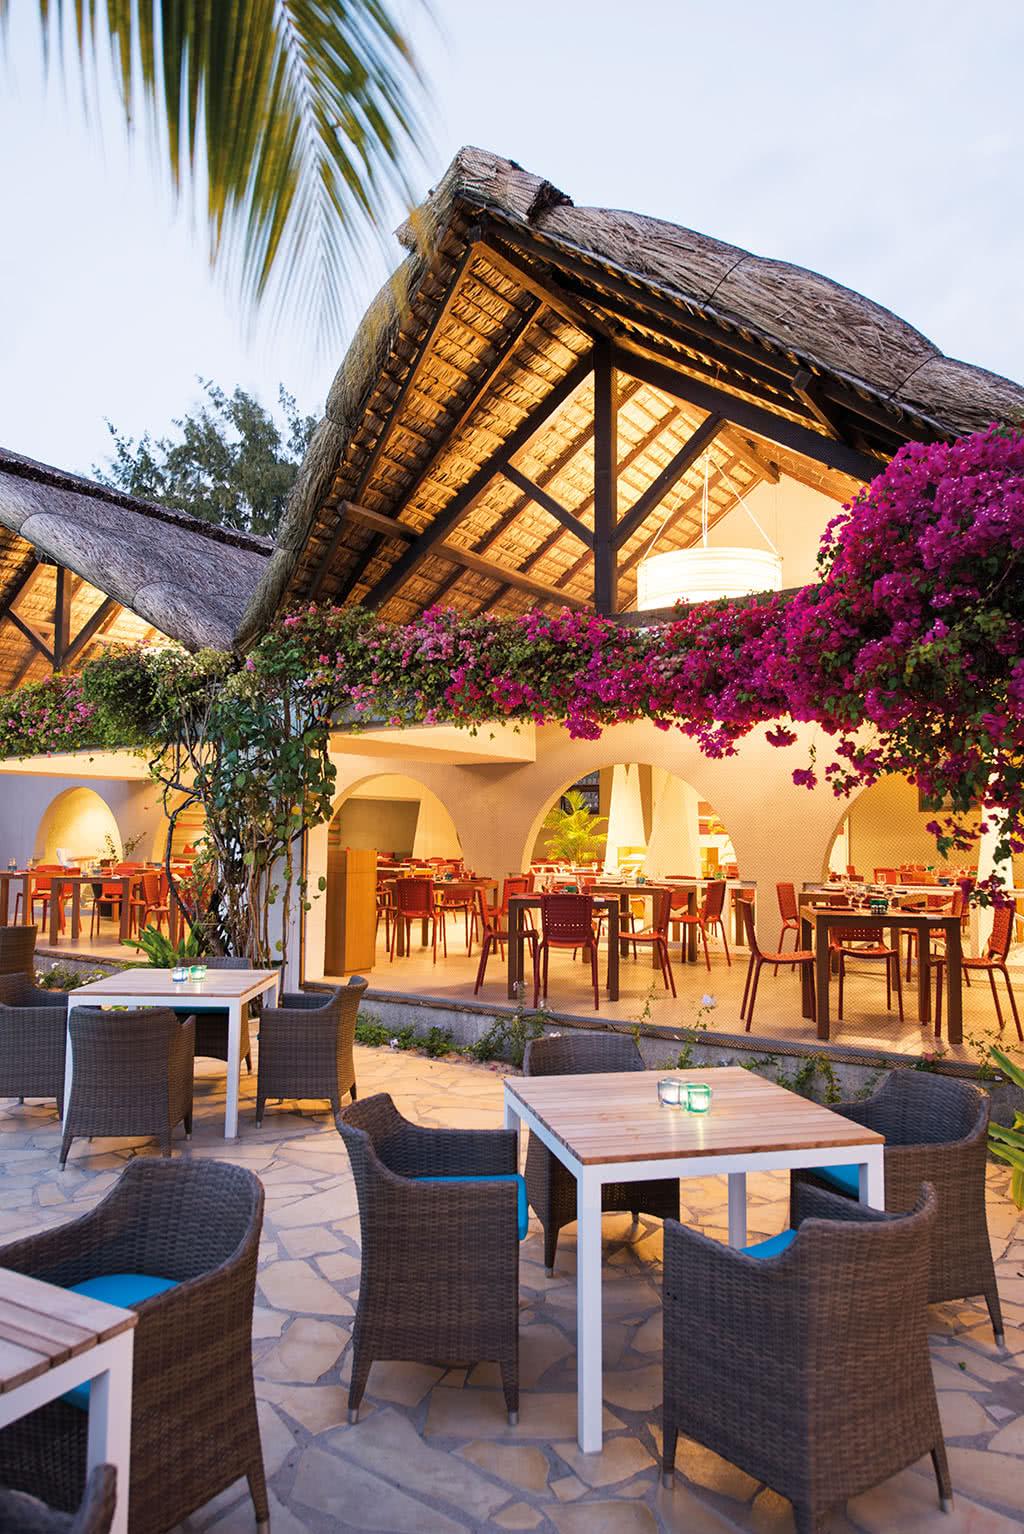 veranda palmar beach h tel 3 voyage ile maurice s jour belle mare. Black Bedroom Furniture Sets. Home Design Ideas